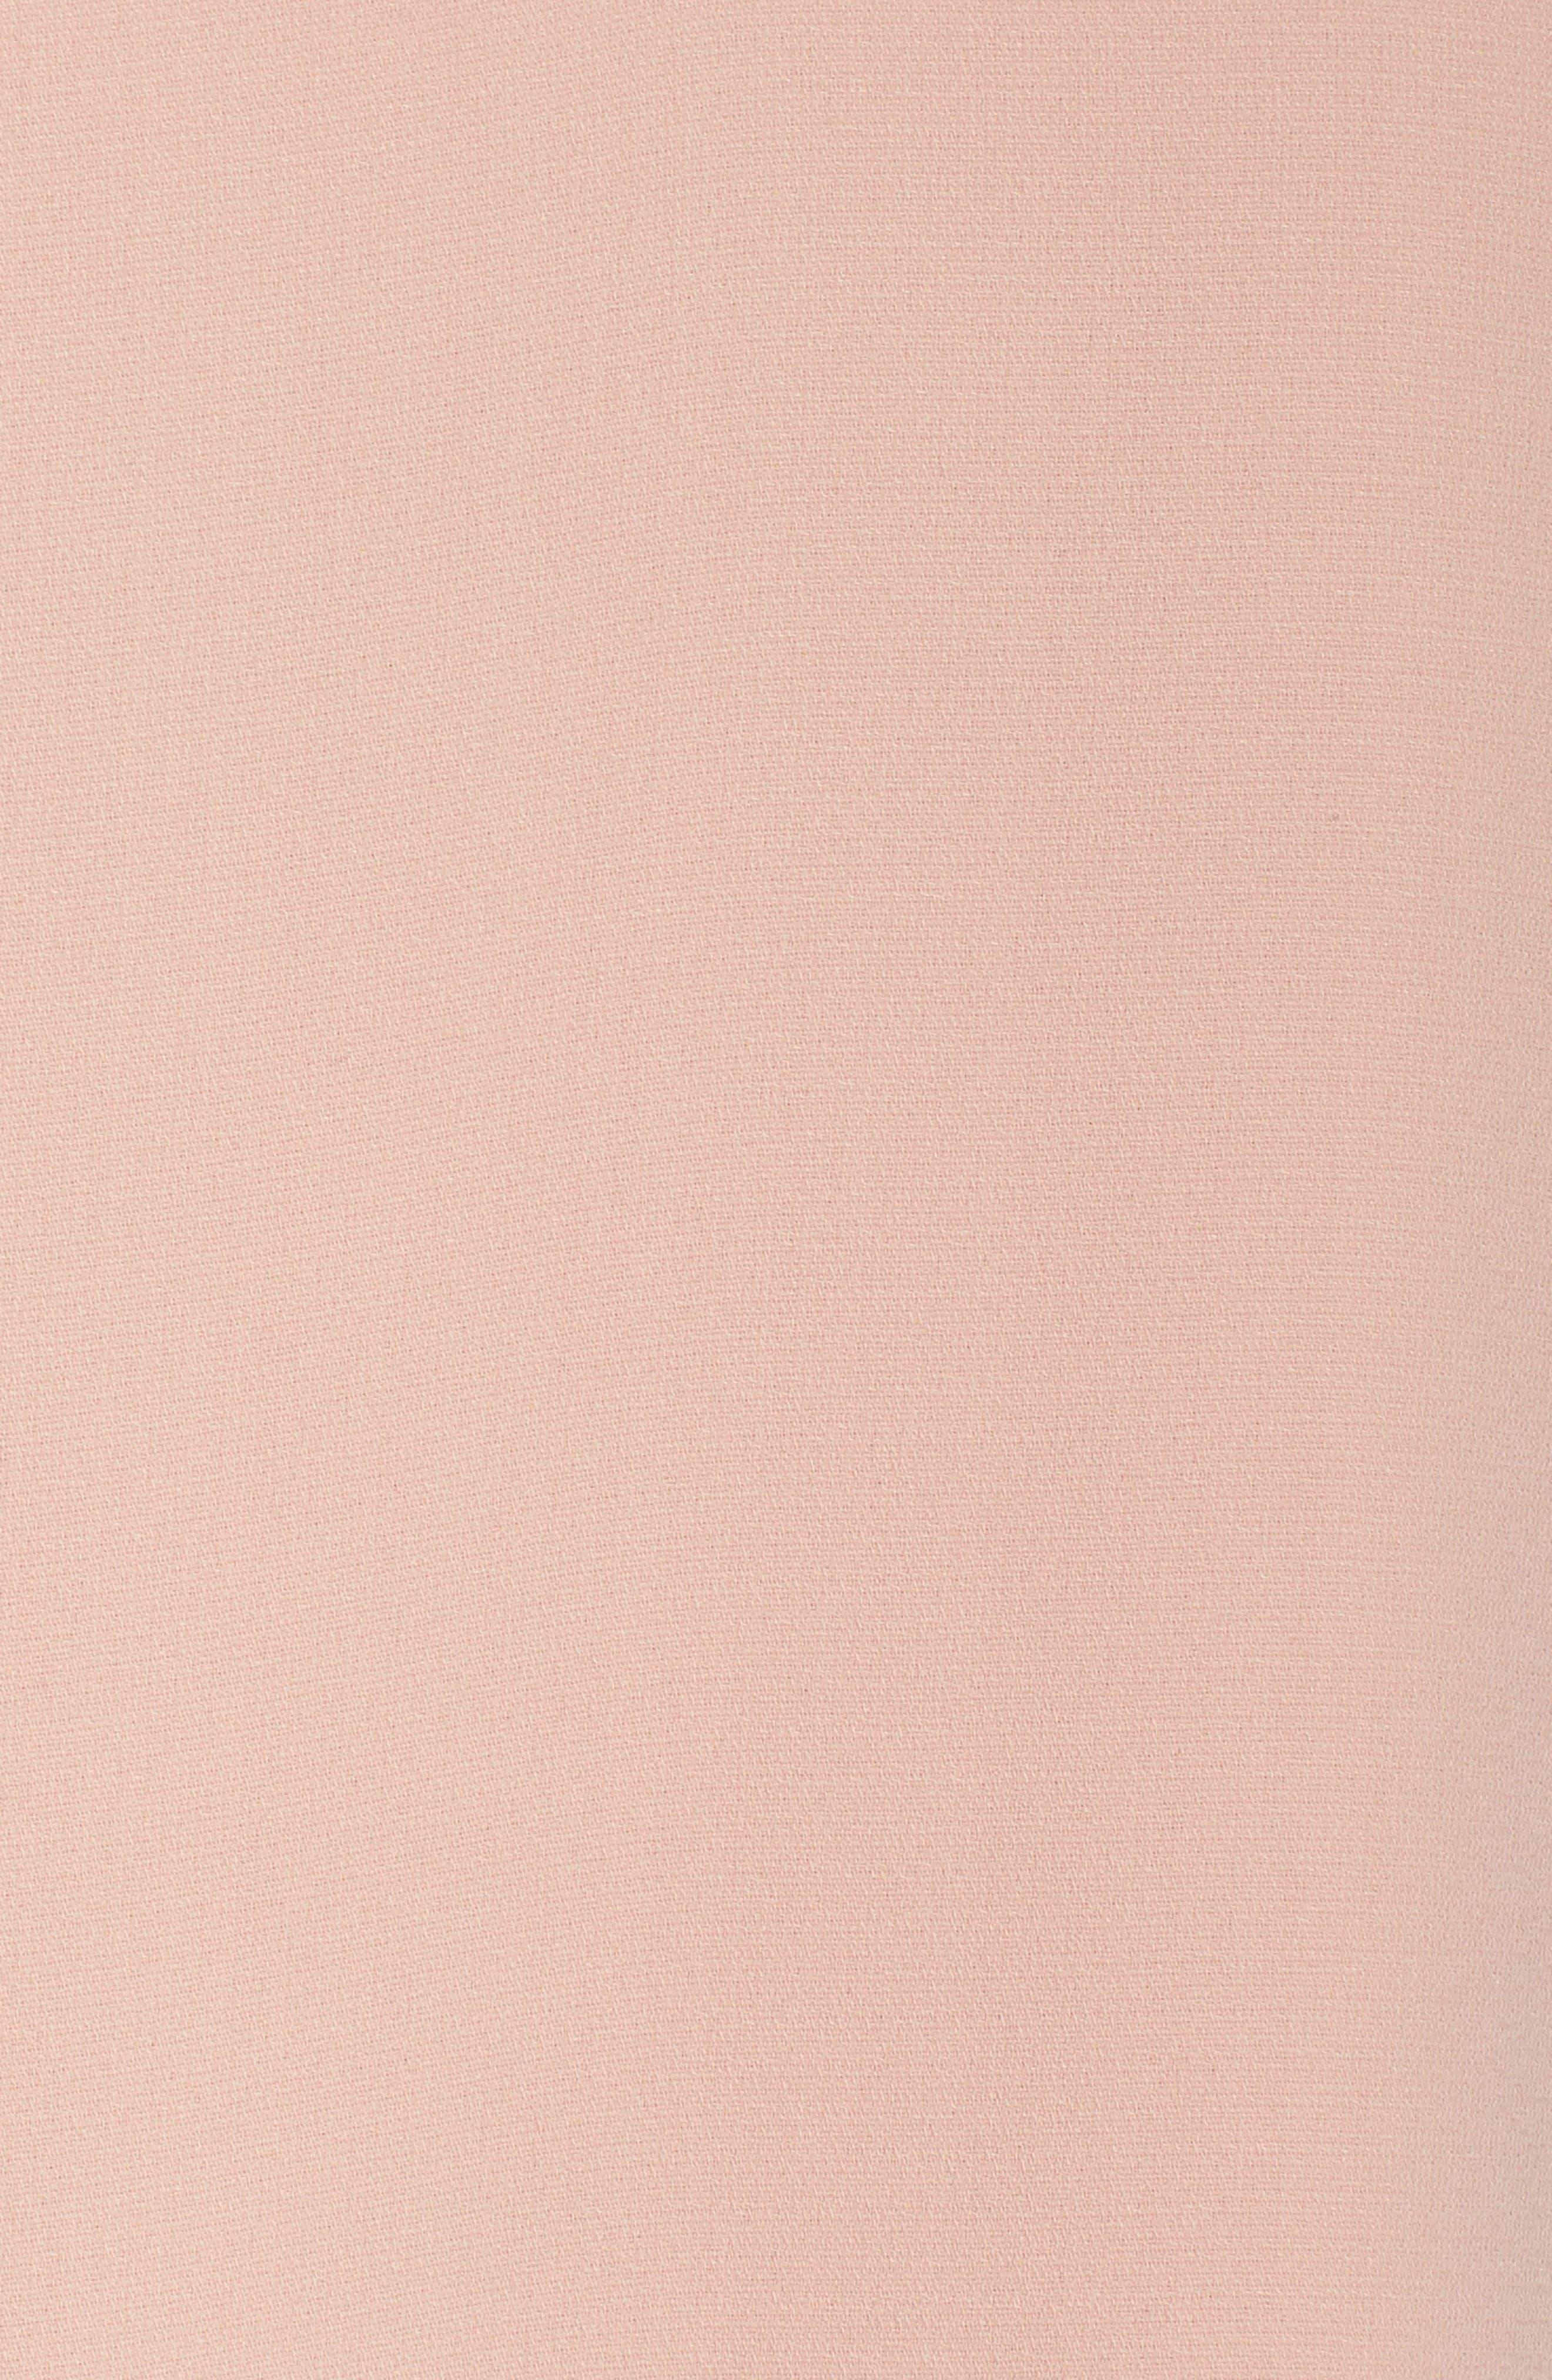 Ruffle Bell Sleeve Dress,                             Alternate thumbnail 6, color,                             Pink Dust